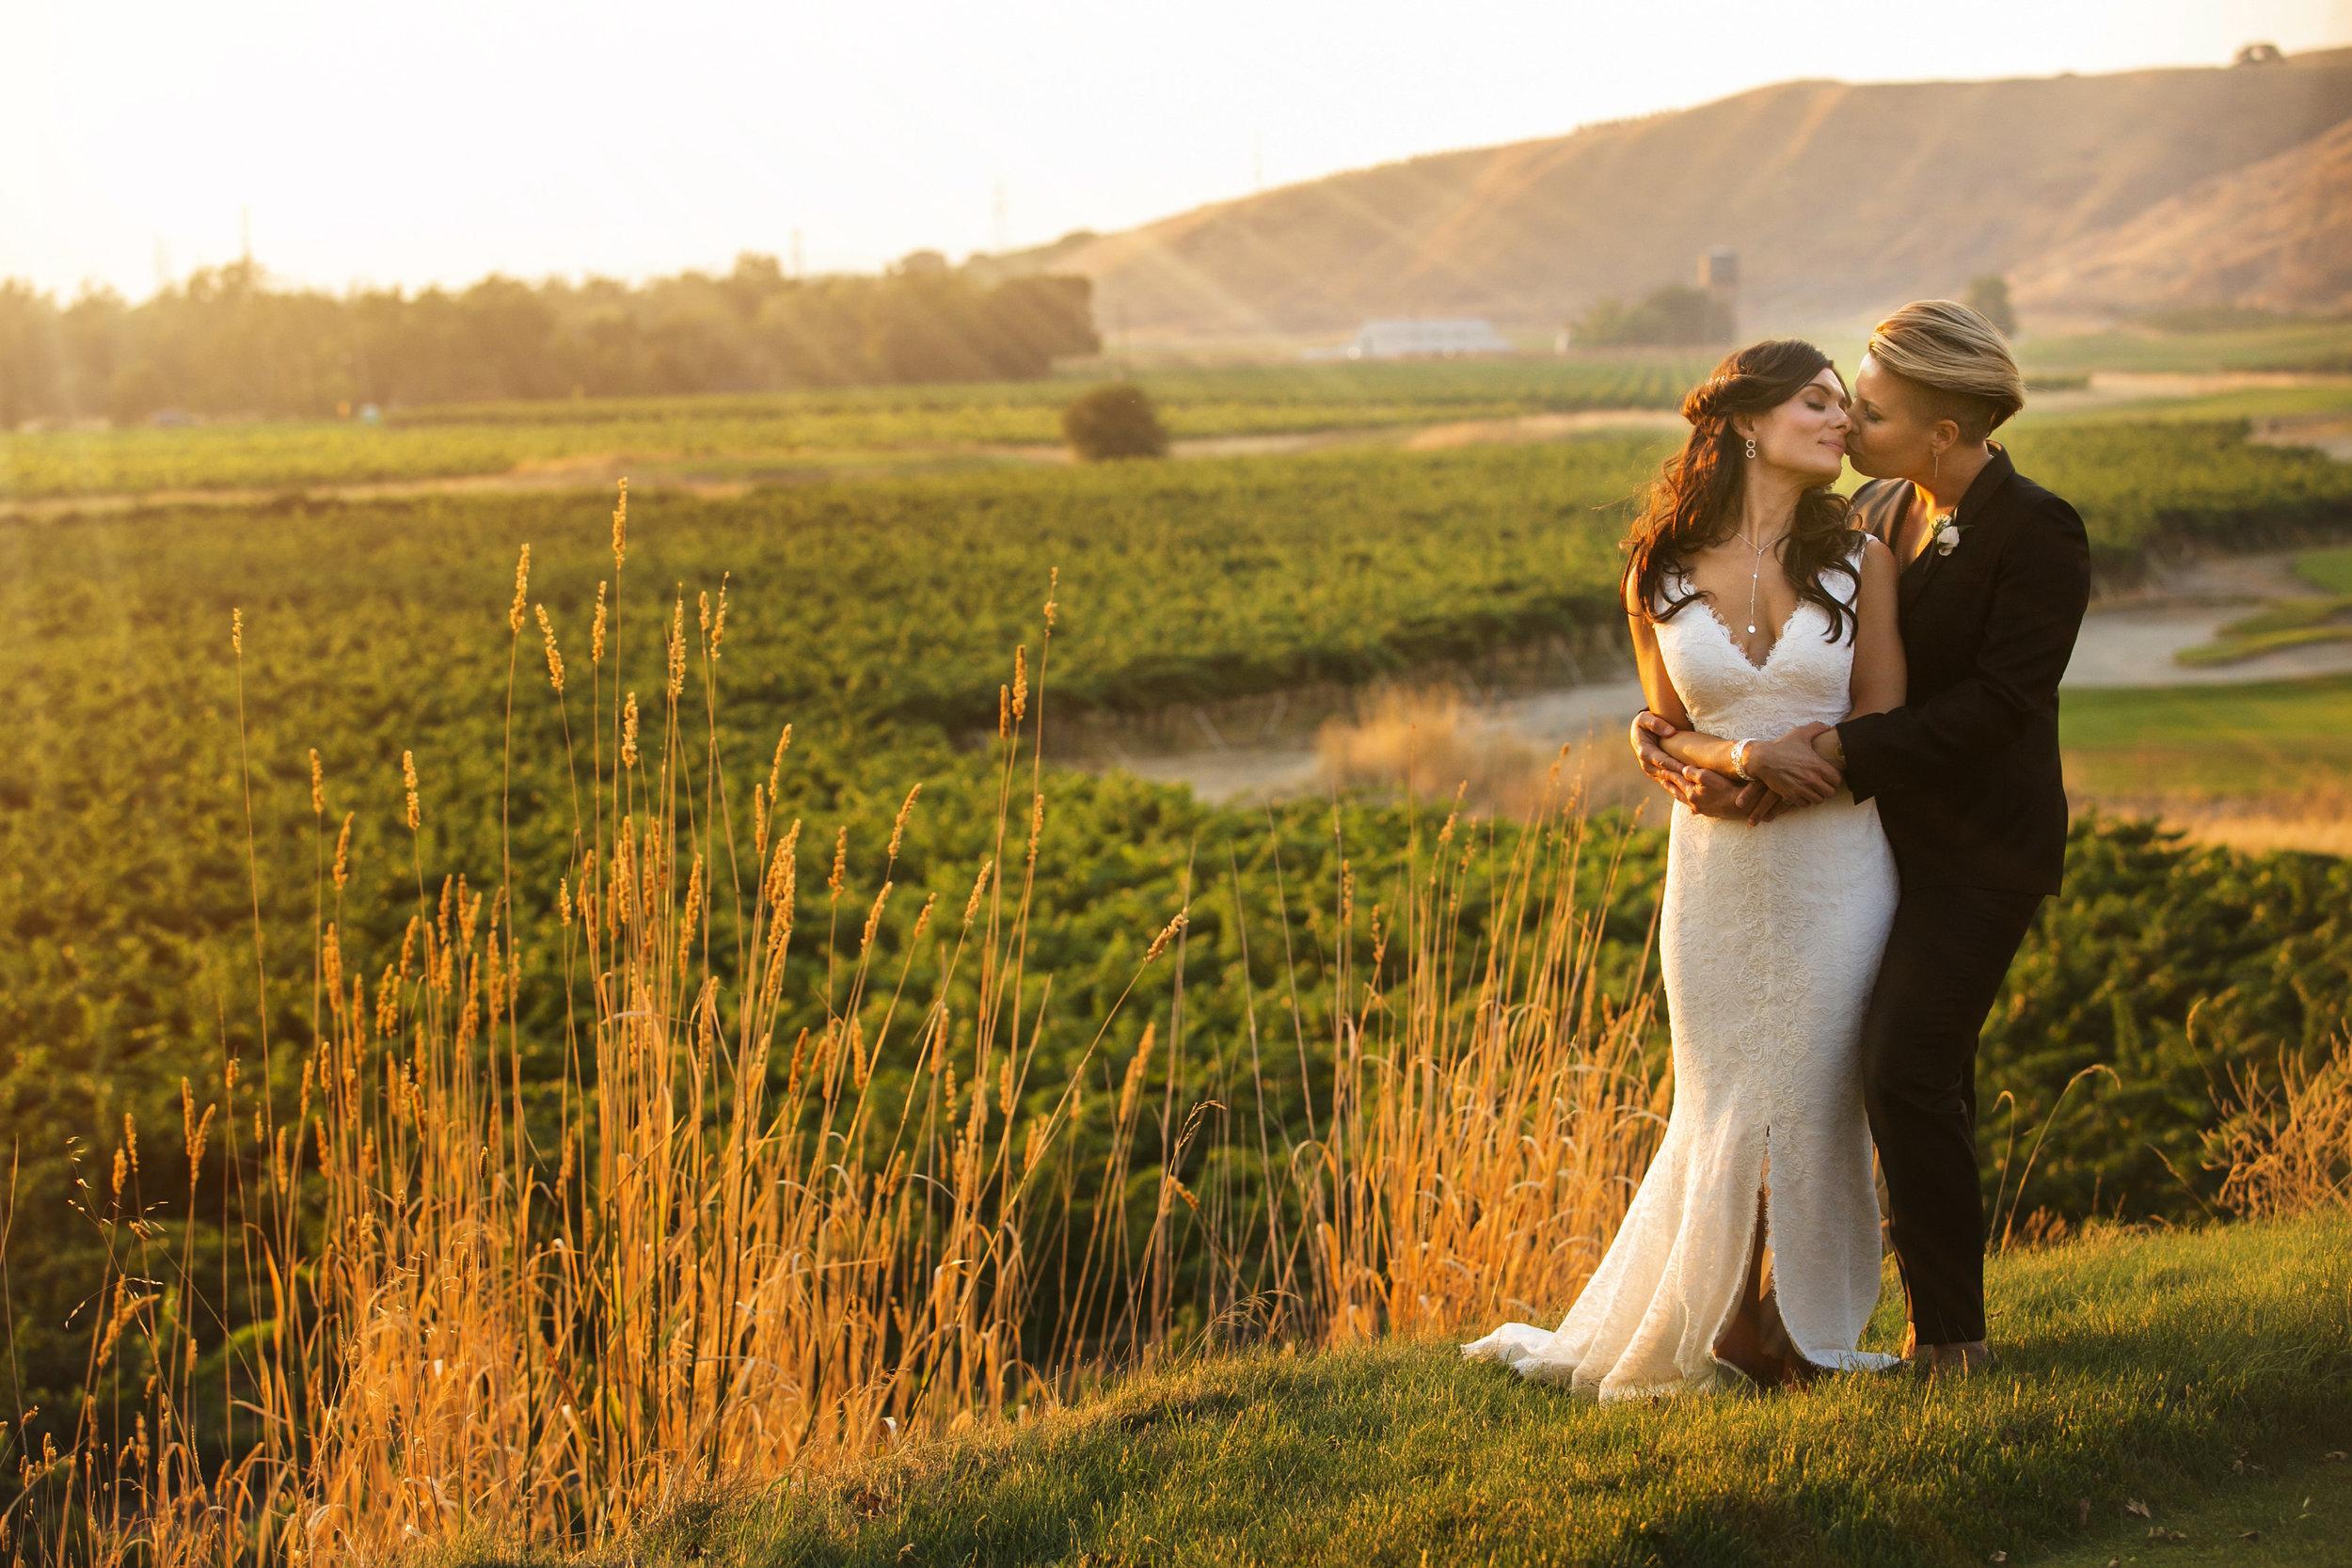 marialee_makeup_gay_wedding_gina&jess_3.JPG